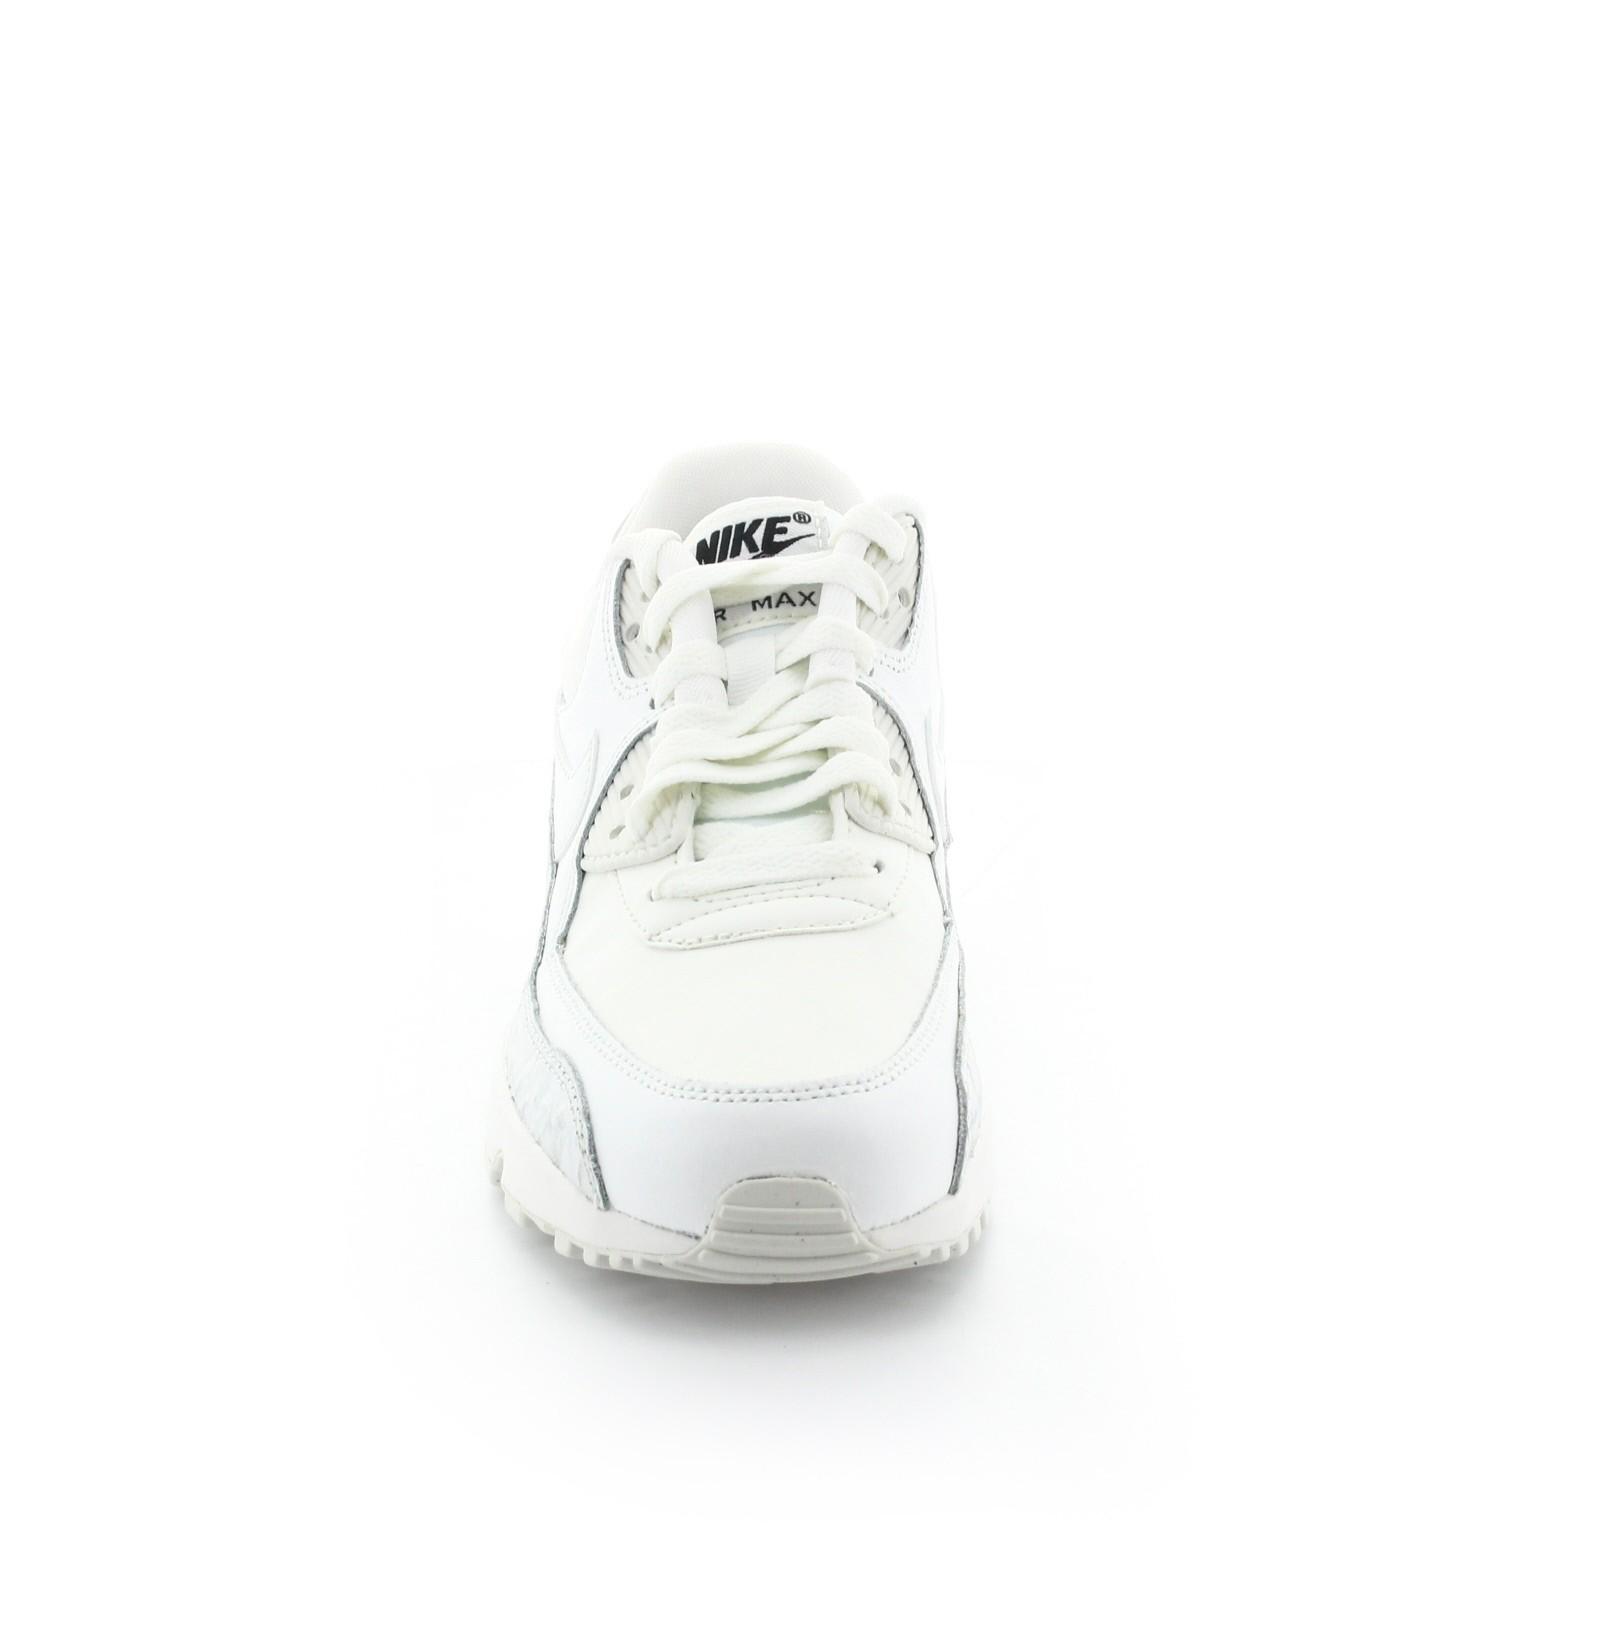 3b50d1c1fd sneakers retro running Nike nike air max 90 ltr se gg - Pantofi ...